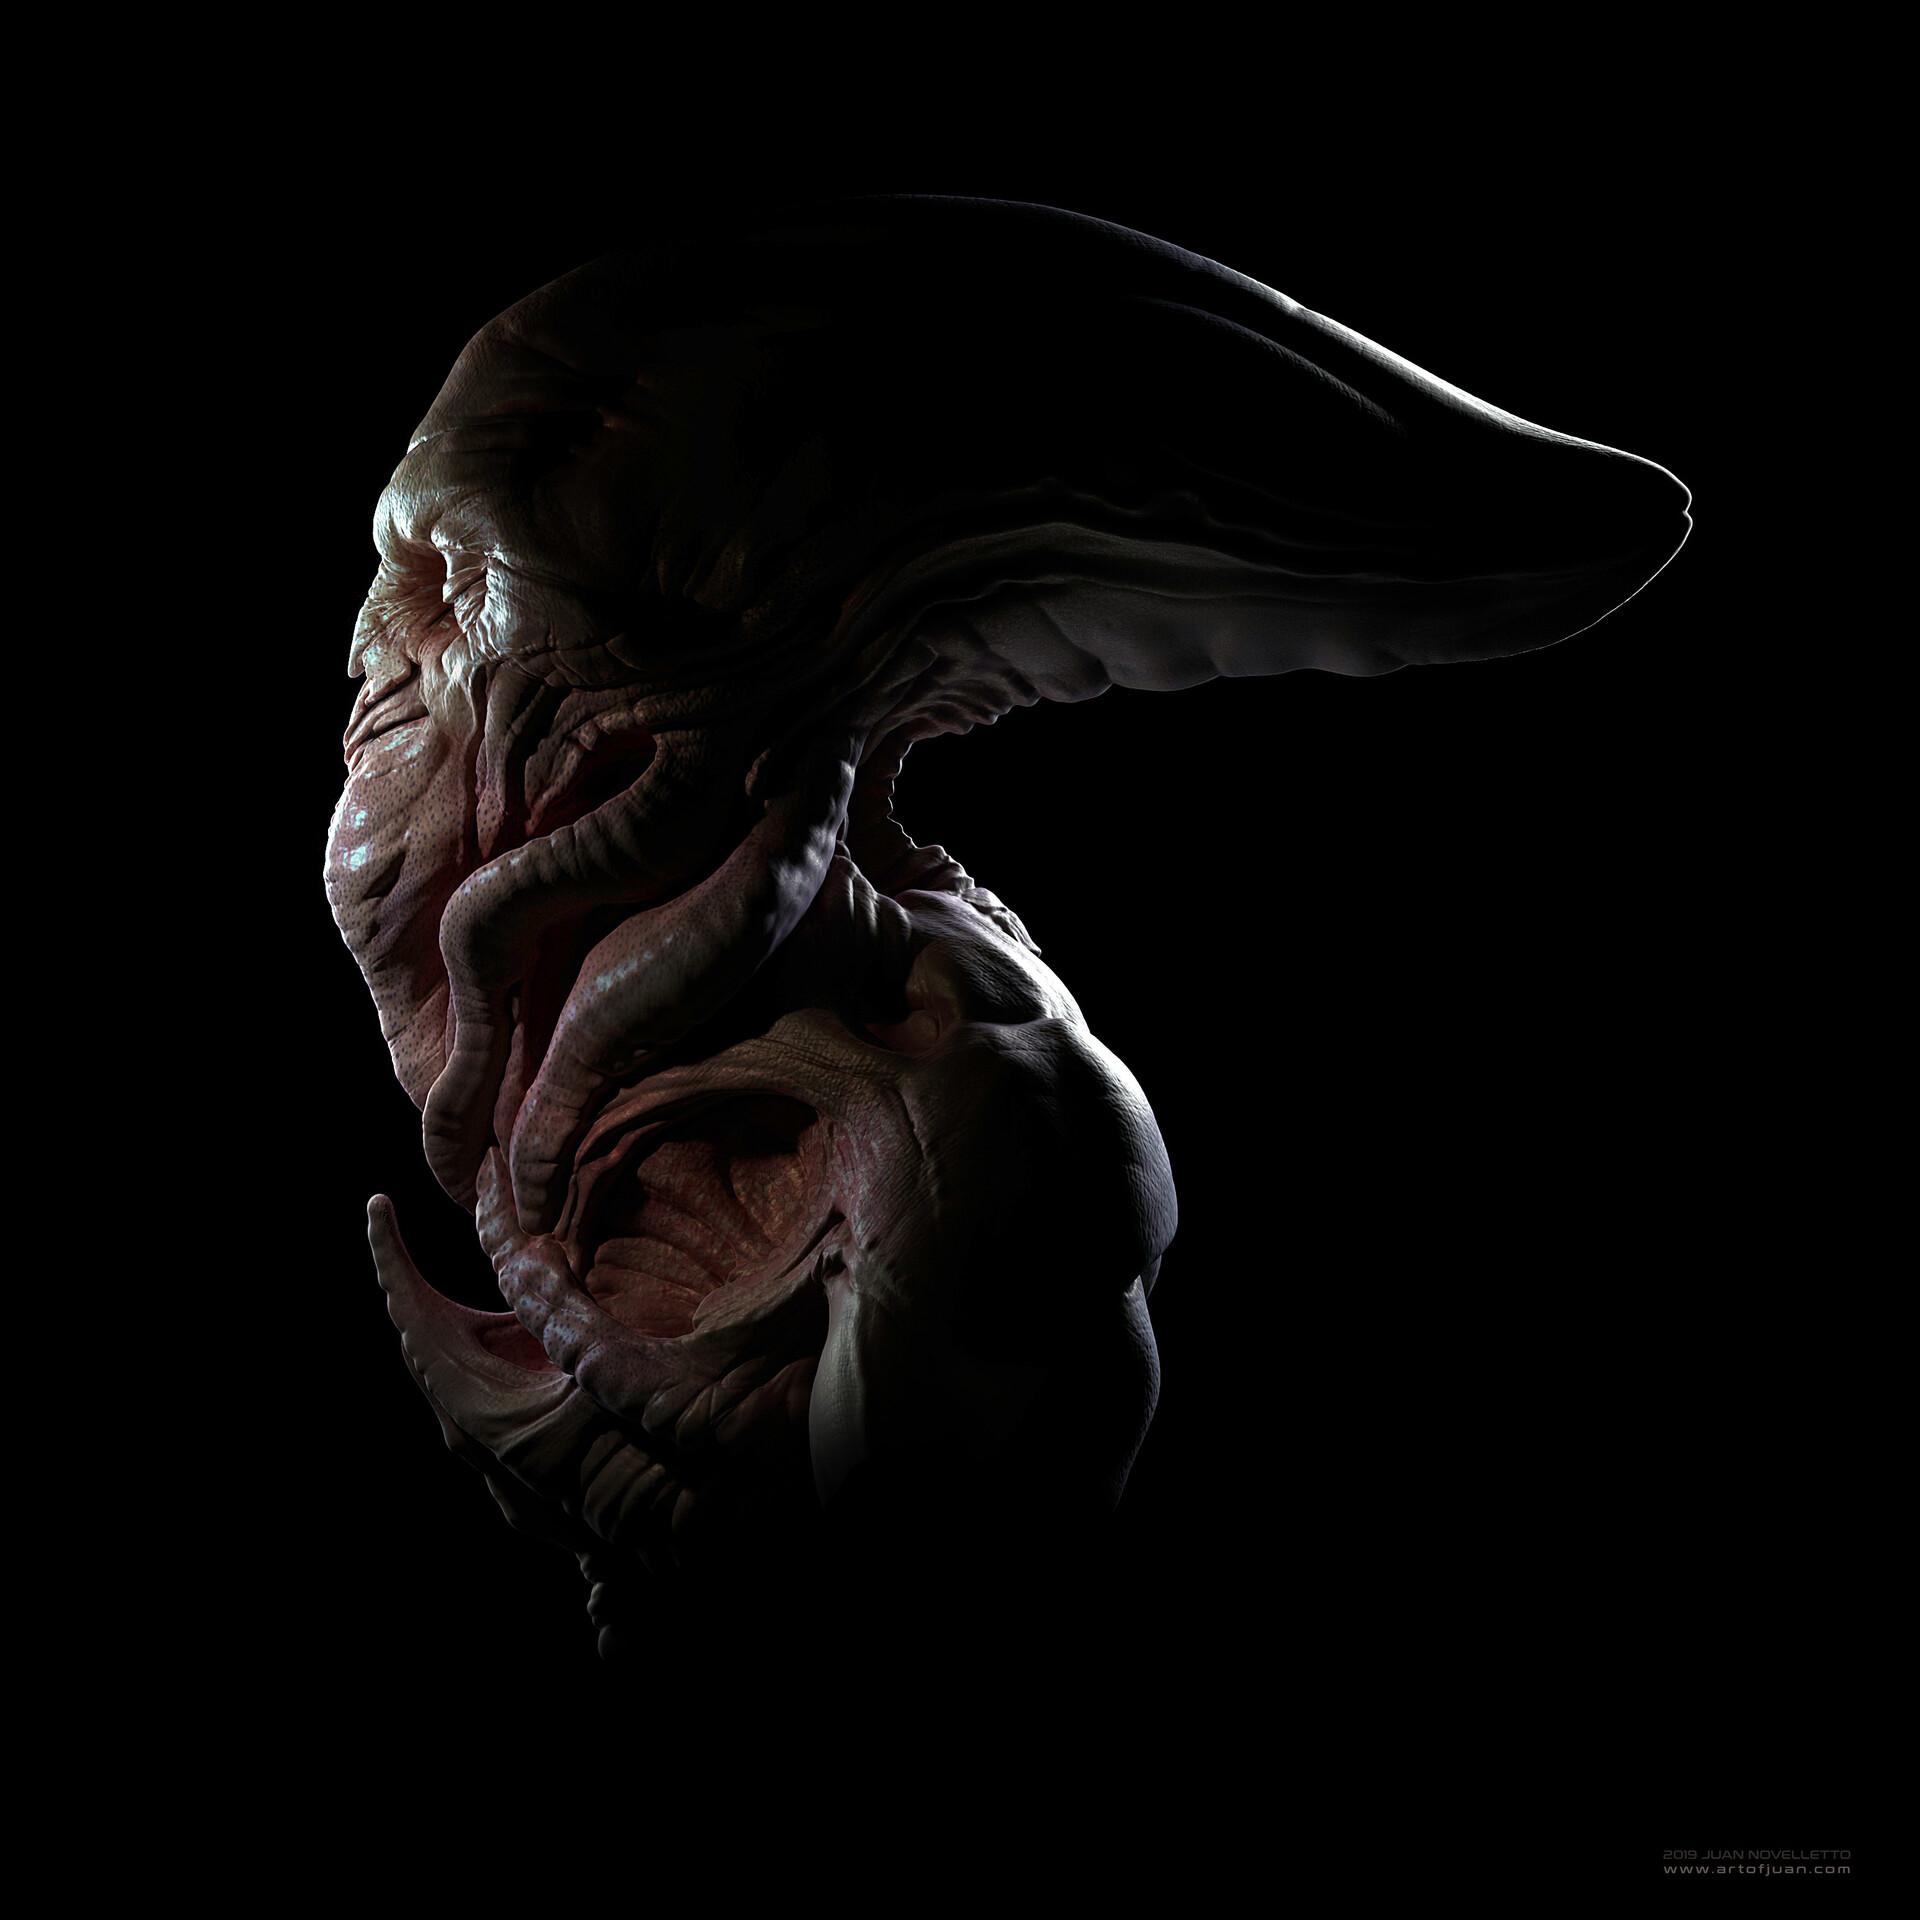 Juan novelletto alien 01 b